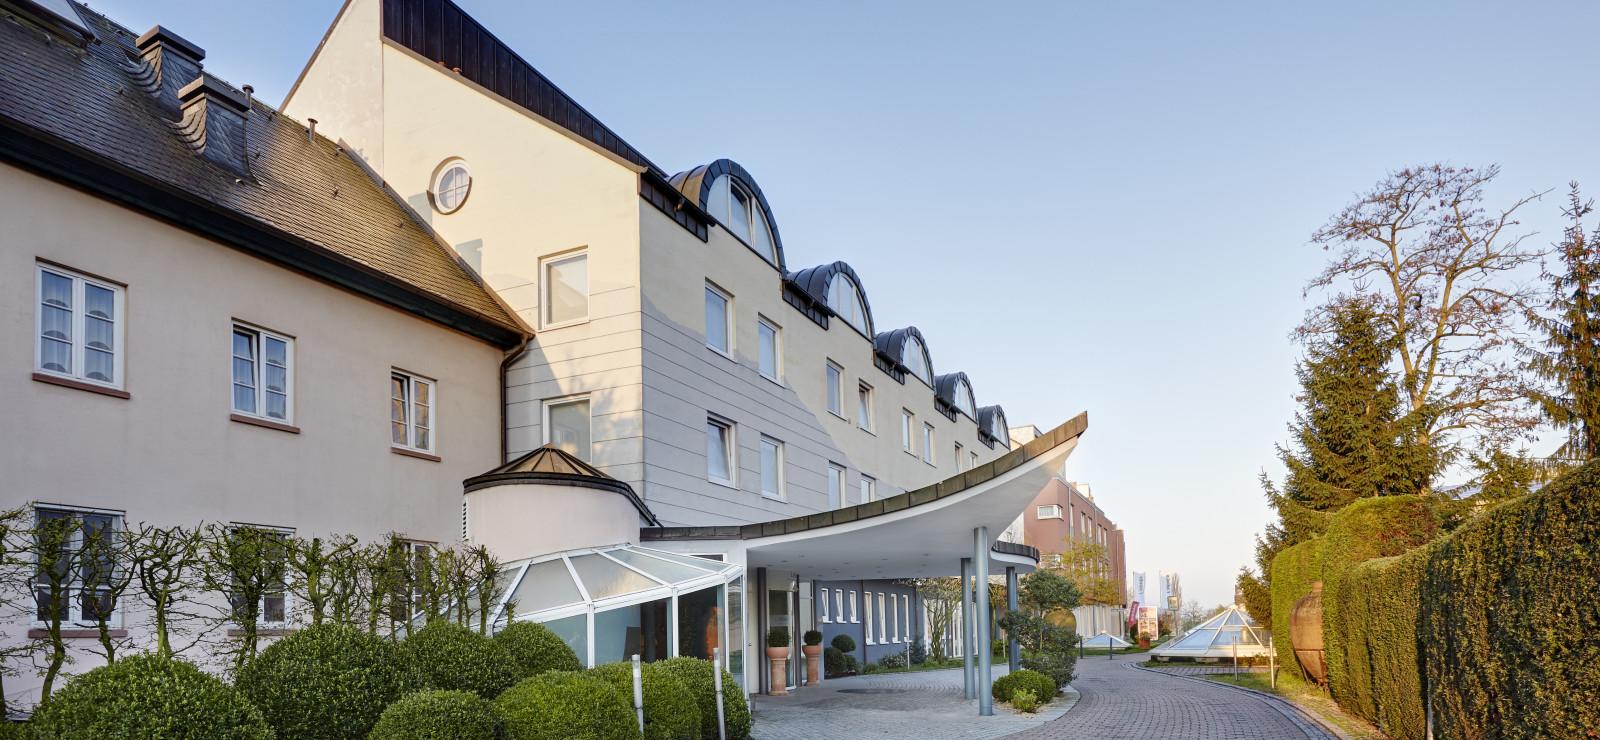 Lindner Hotel & Spa Binshof Bilder | Bild 1